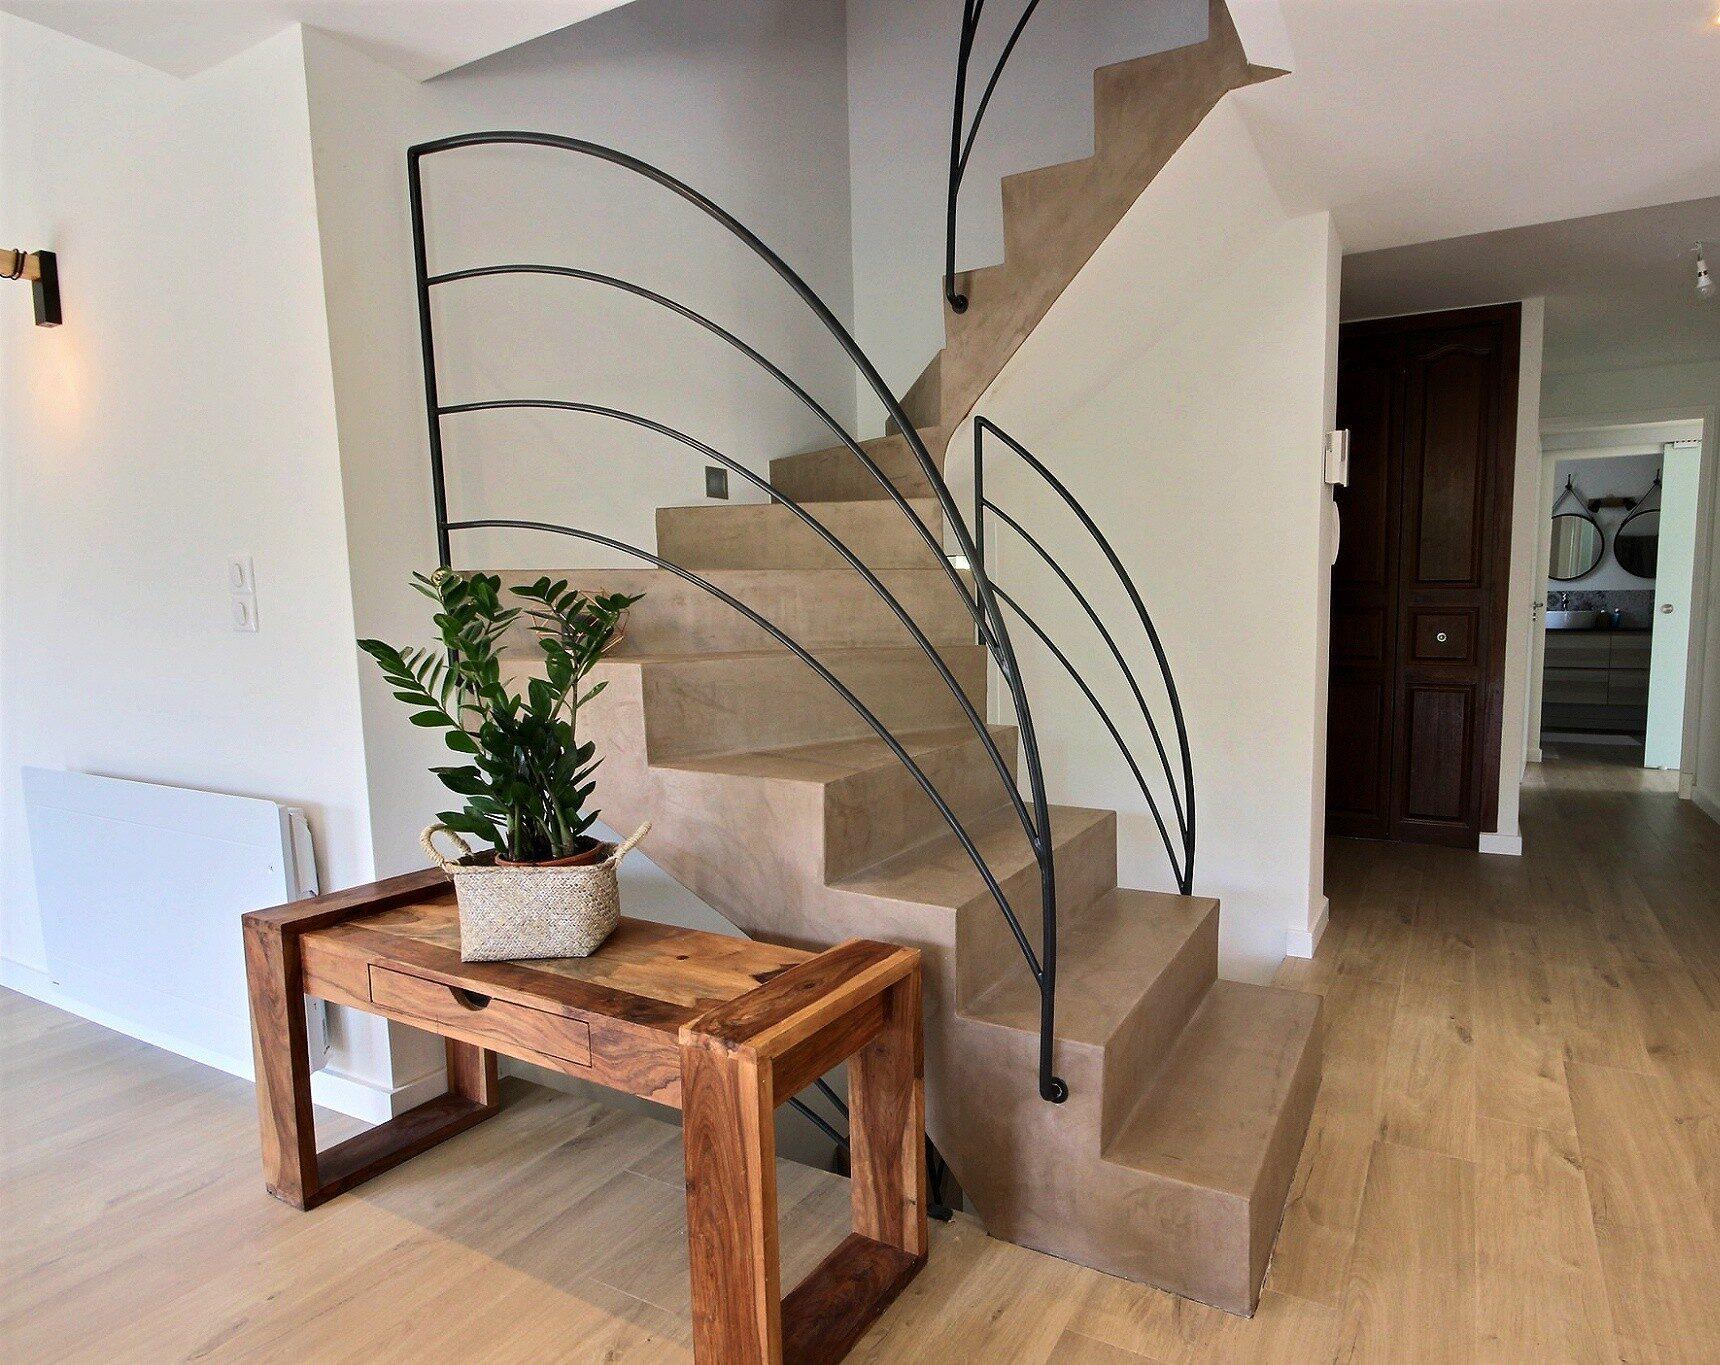 Rénovation escalier béton ciré Avéo Styles & Travaux